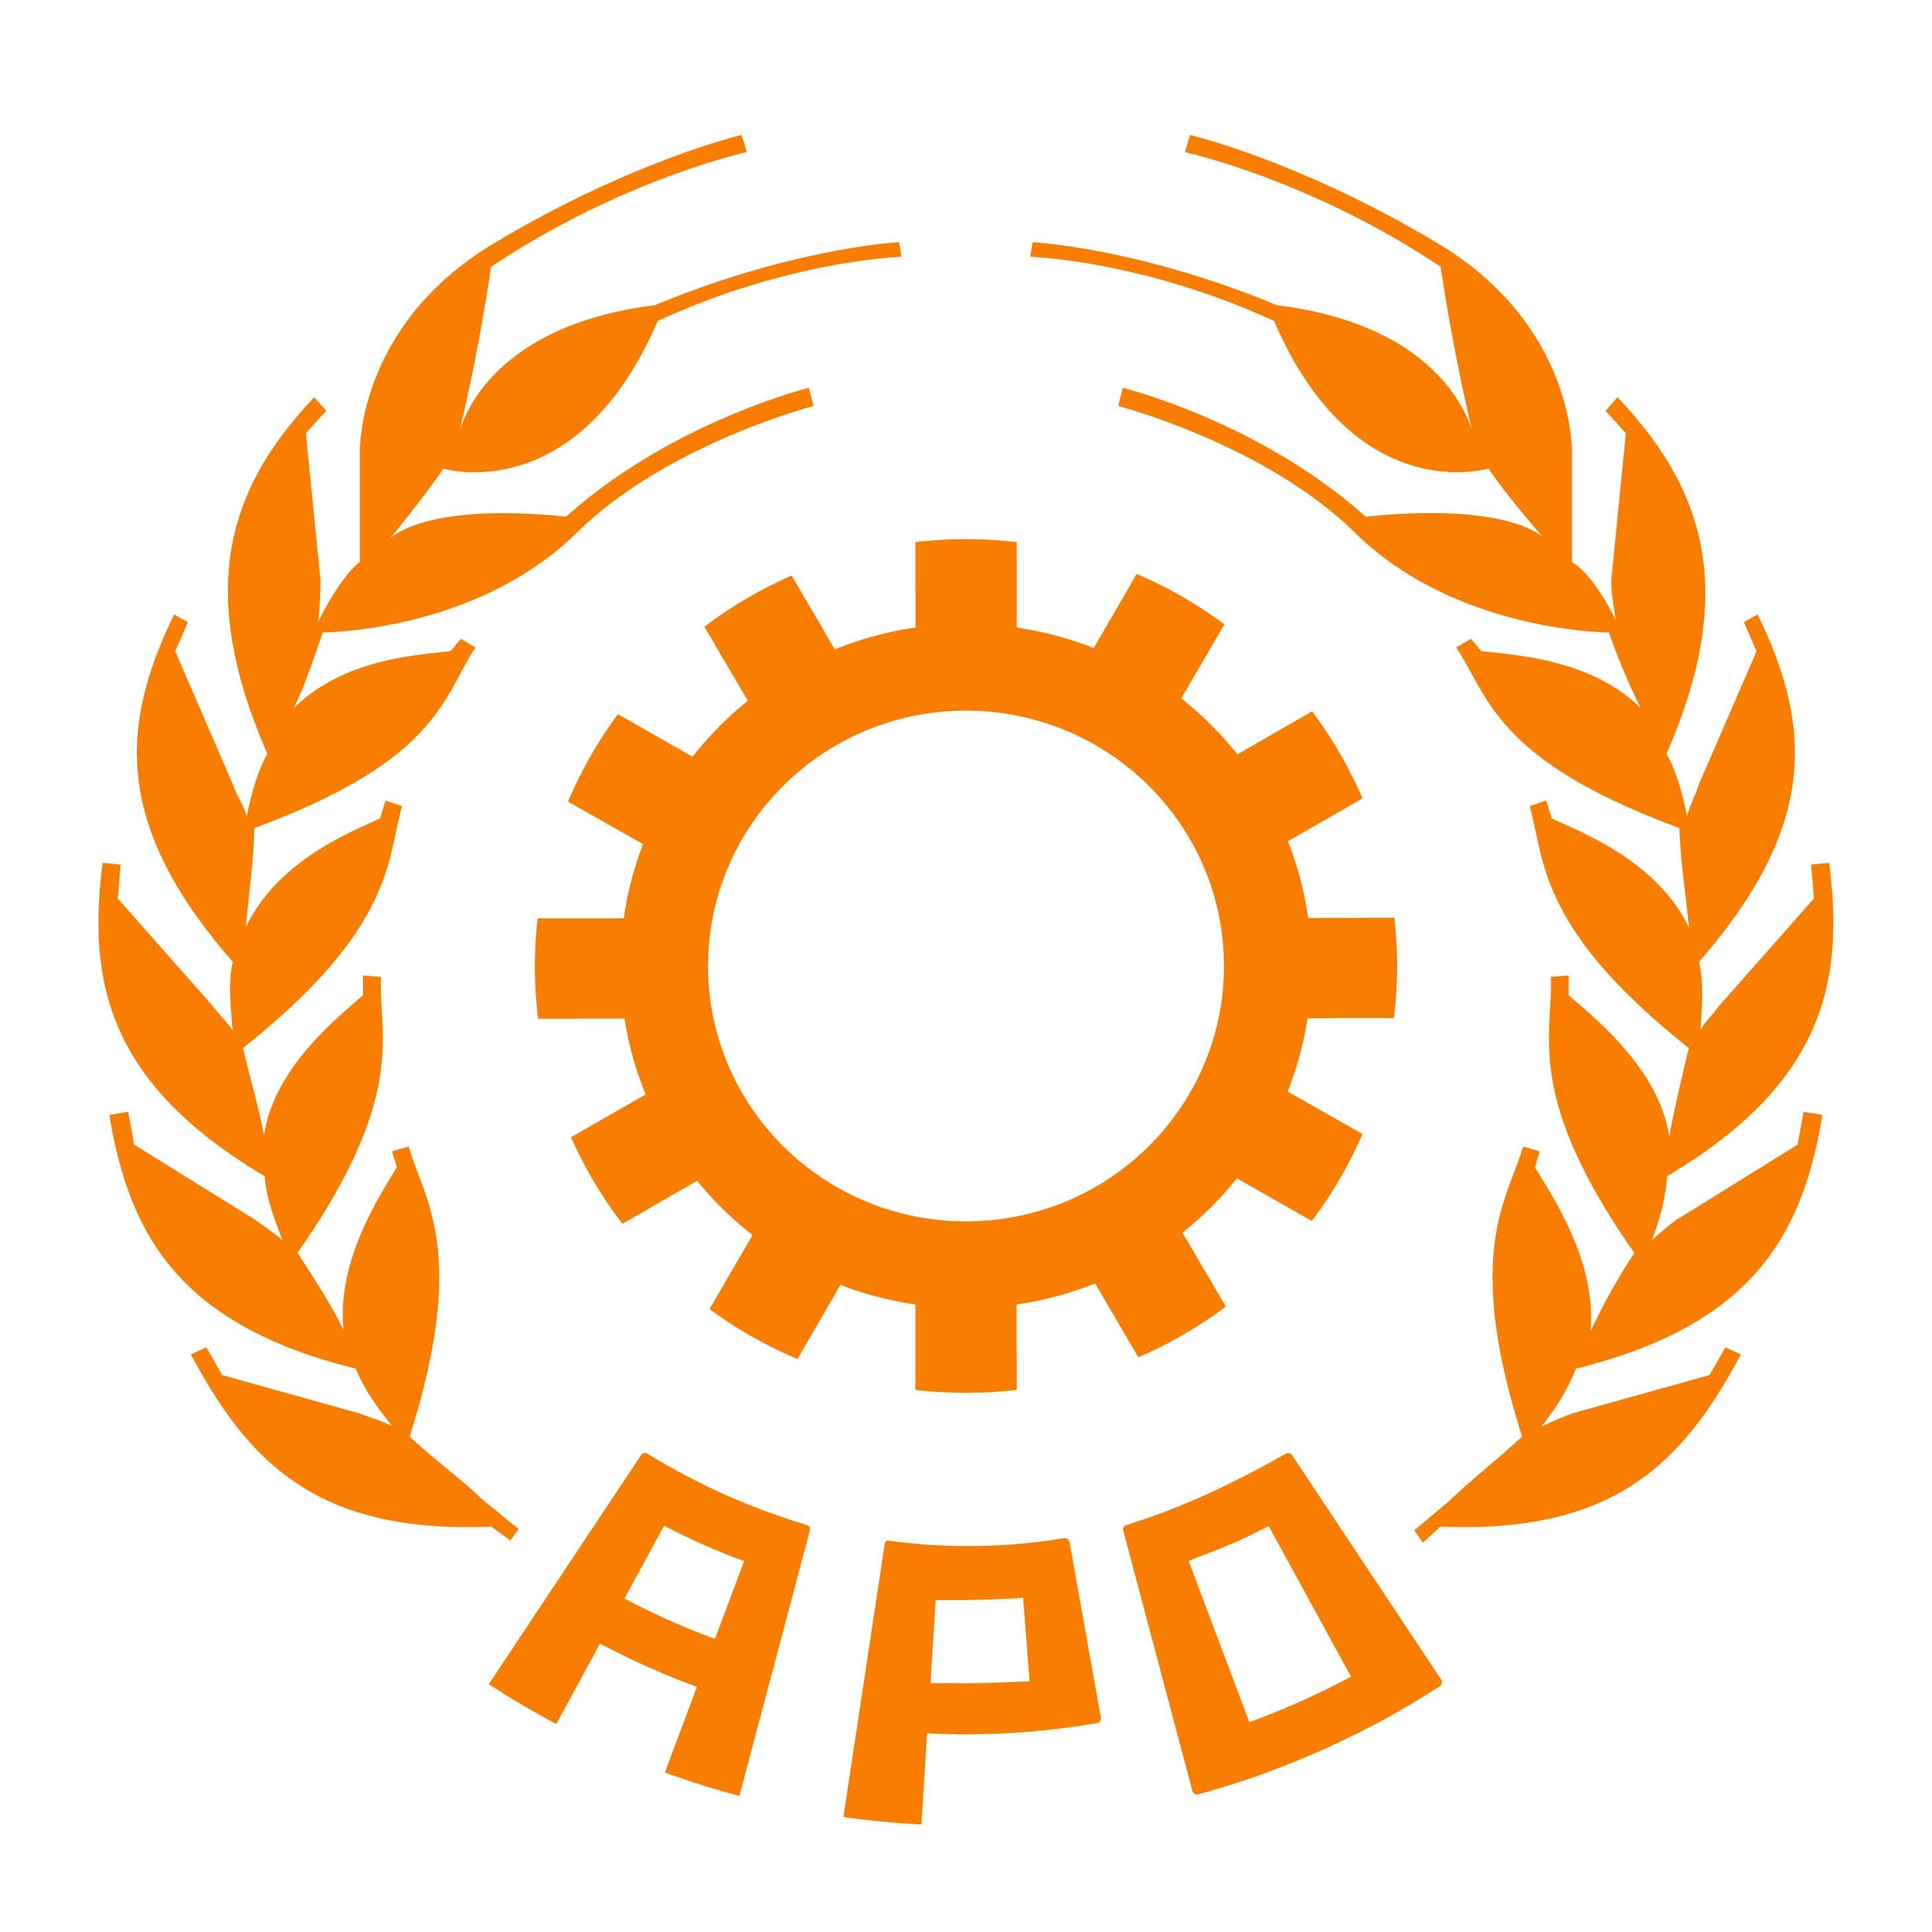 logo for Asian Productivity Organization